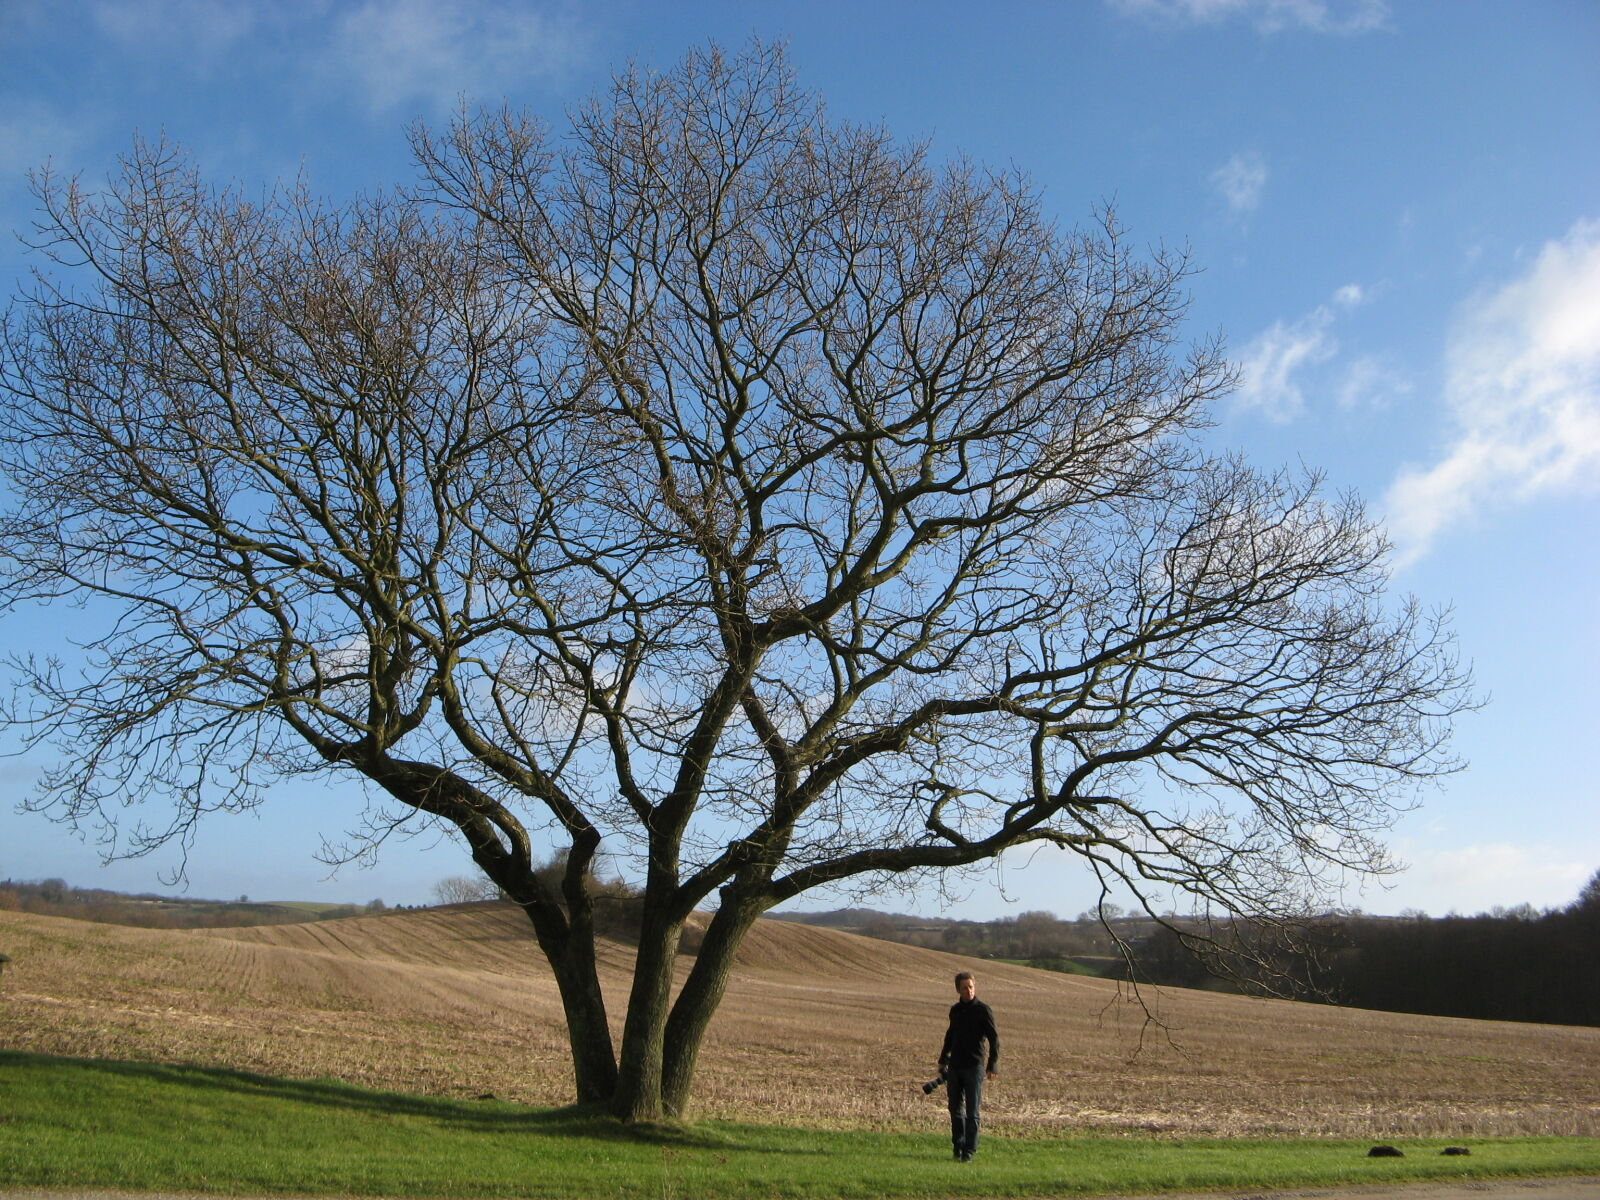 alone, countryside, daylight, environment